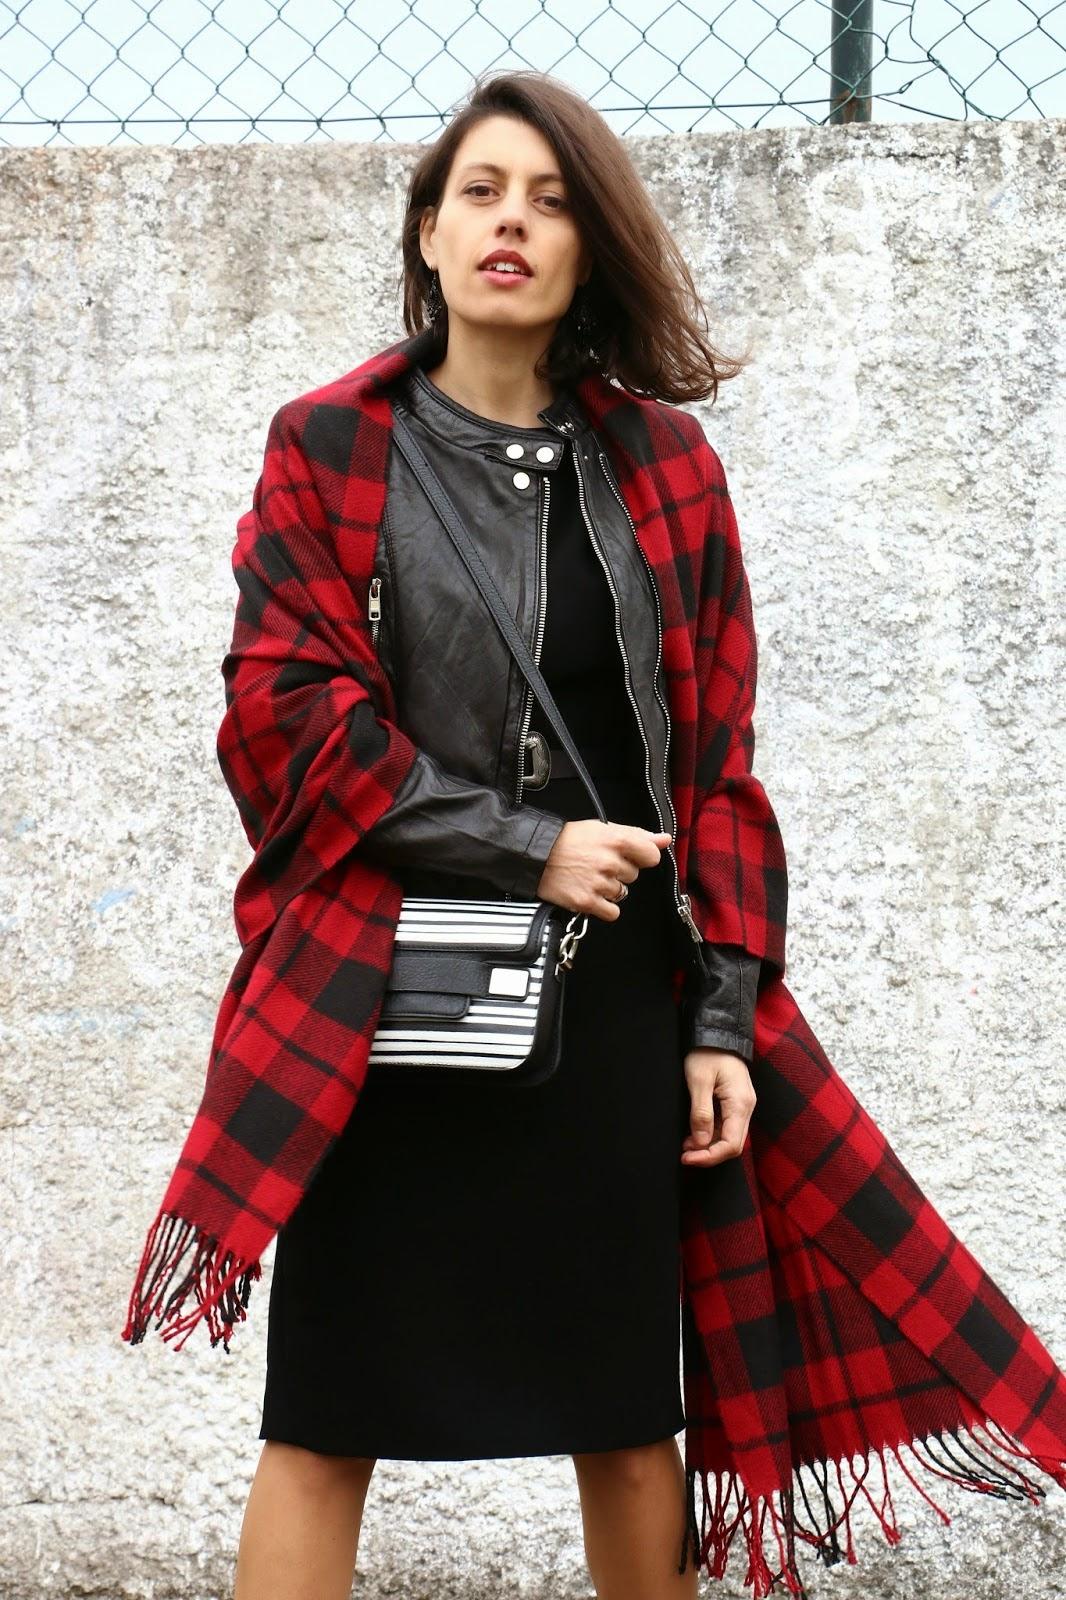 http://ilovefitametrica.blogspot.pt/2015/02/black-dress.html